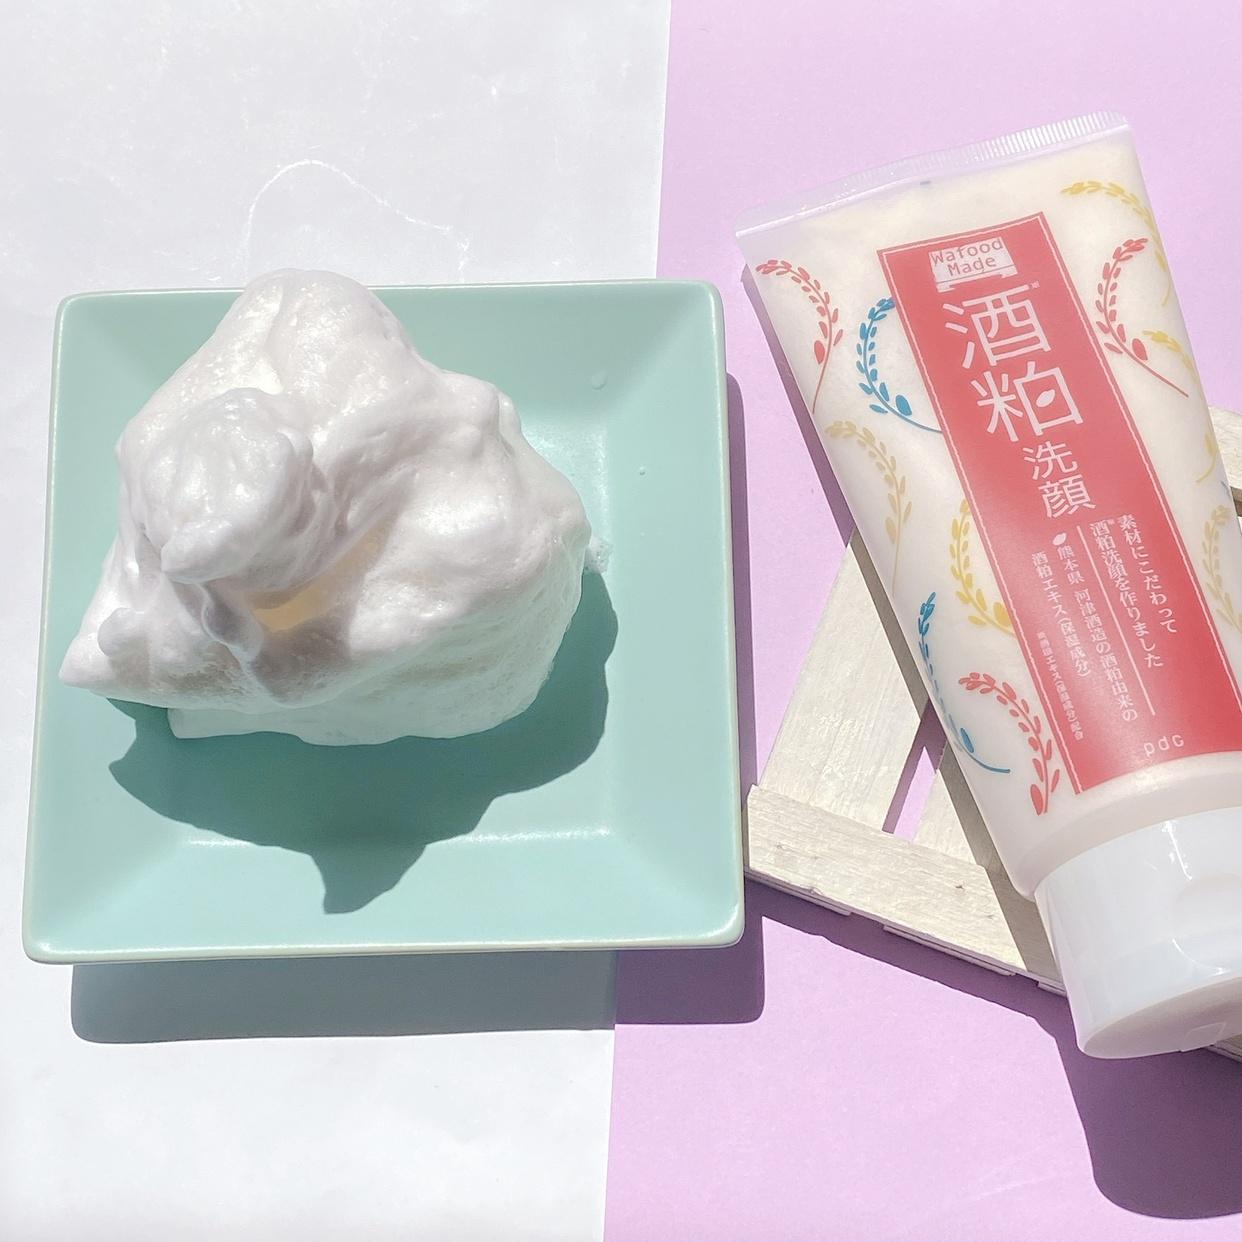 Wafood Made(ワフードメイド) SK洗顔 (酒粕洗顔)に関するエミリーさんの口コミ画像2